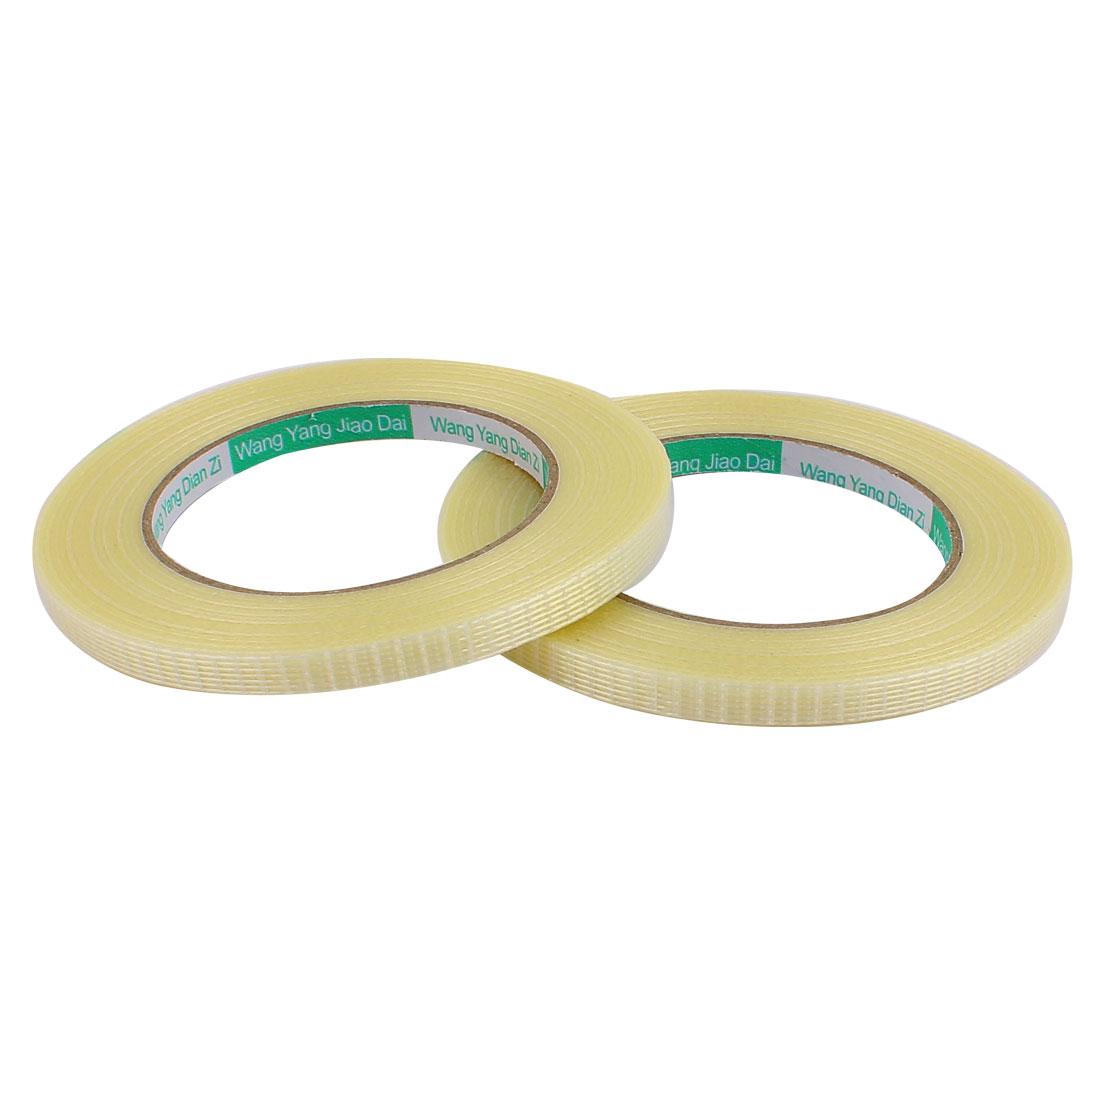 2 Pcs 8mm Height 50M Length Long Adhesive Insulating Grid Glass Fiber Tape Roll